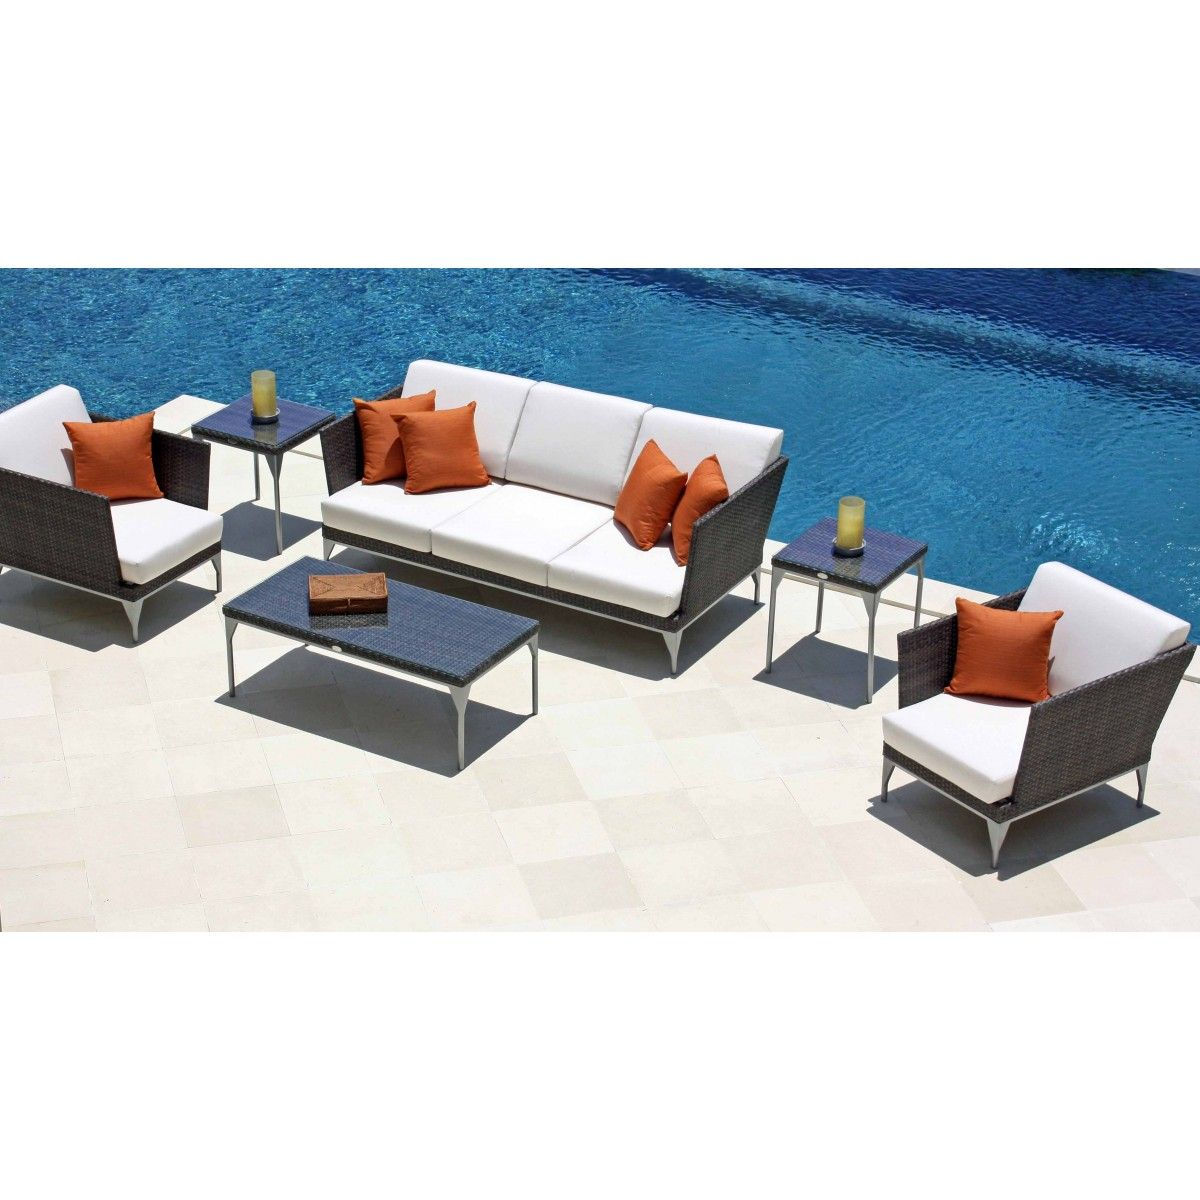 Skyline Brafta Sofa High Quality Durable Luxury Outdoor Garden Furniture Uberinteriors Sofa Outdoor Sofa Luxury Furniture